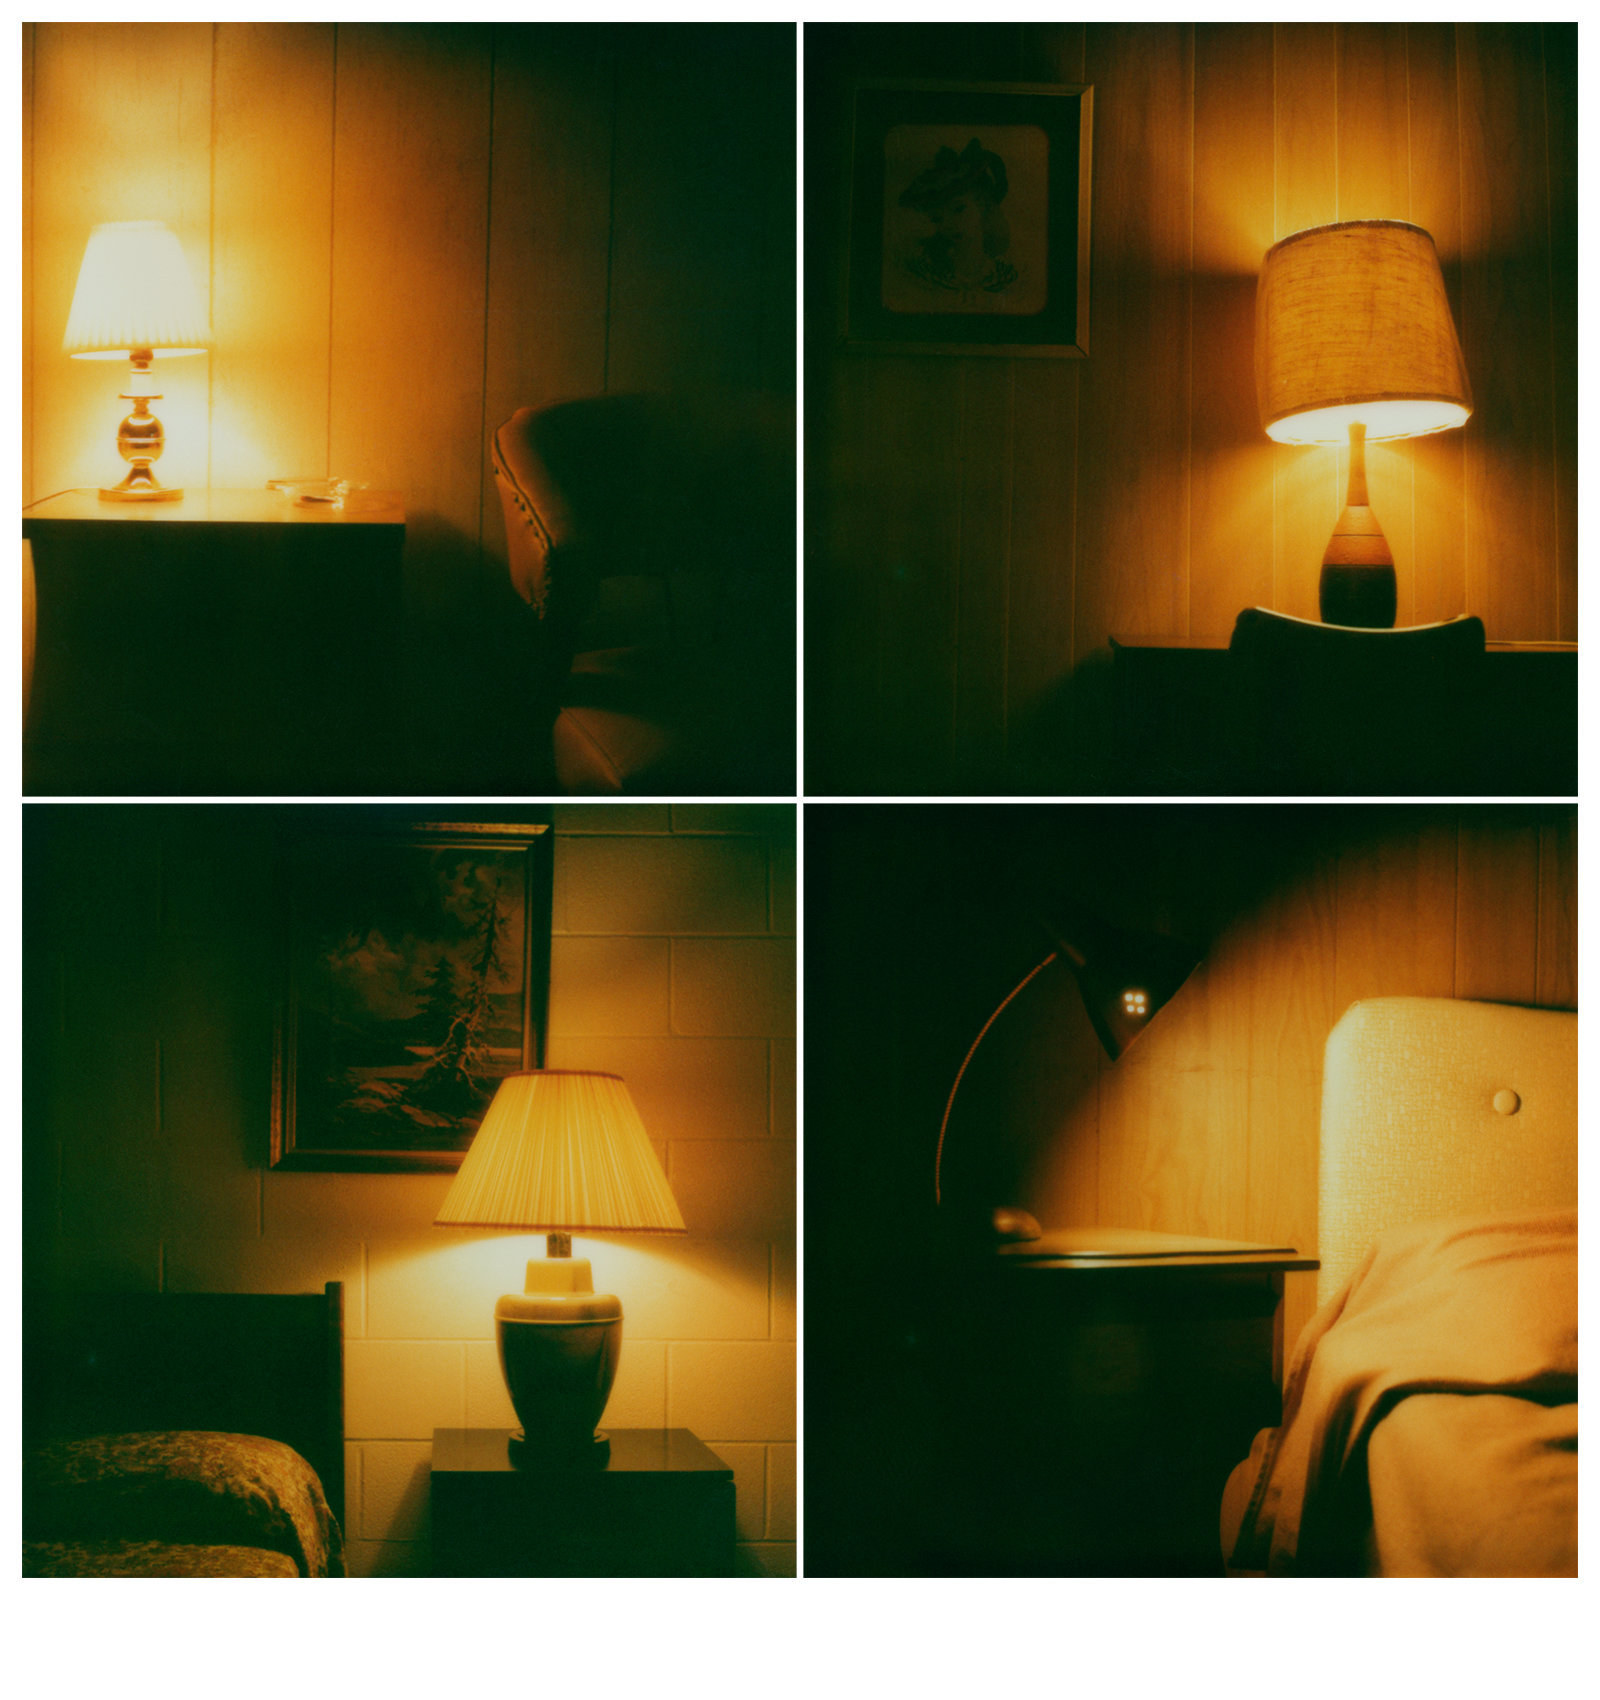 15_Motel Lamps A LR 1556.jpg